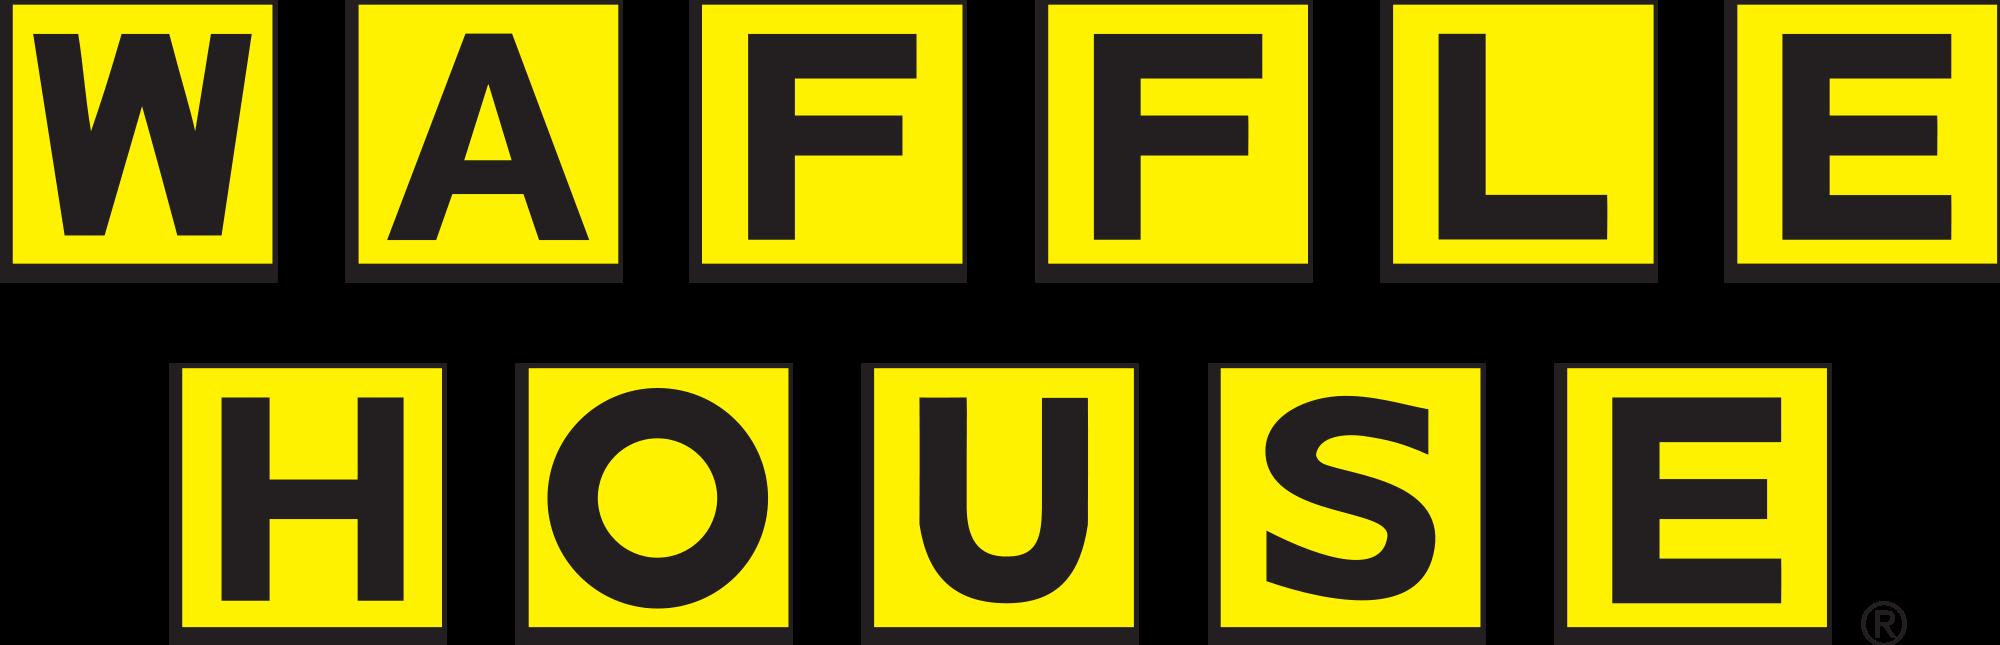 File logo svg wikimedia. Waffle house png